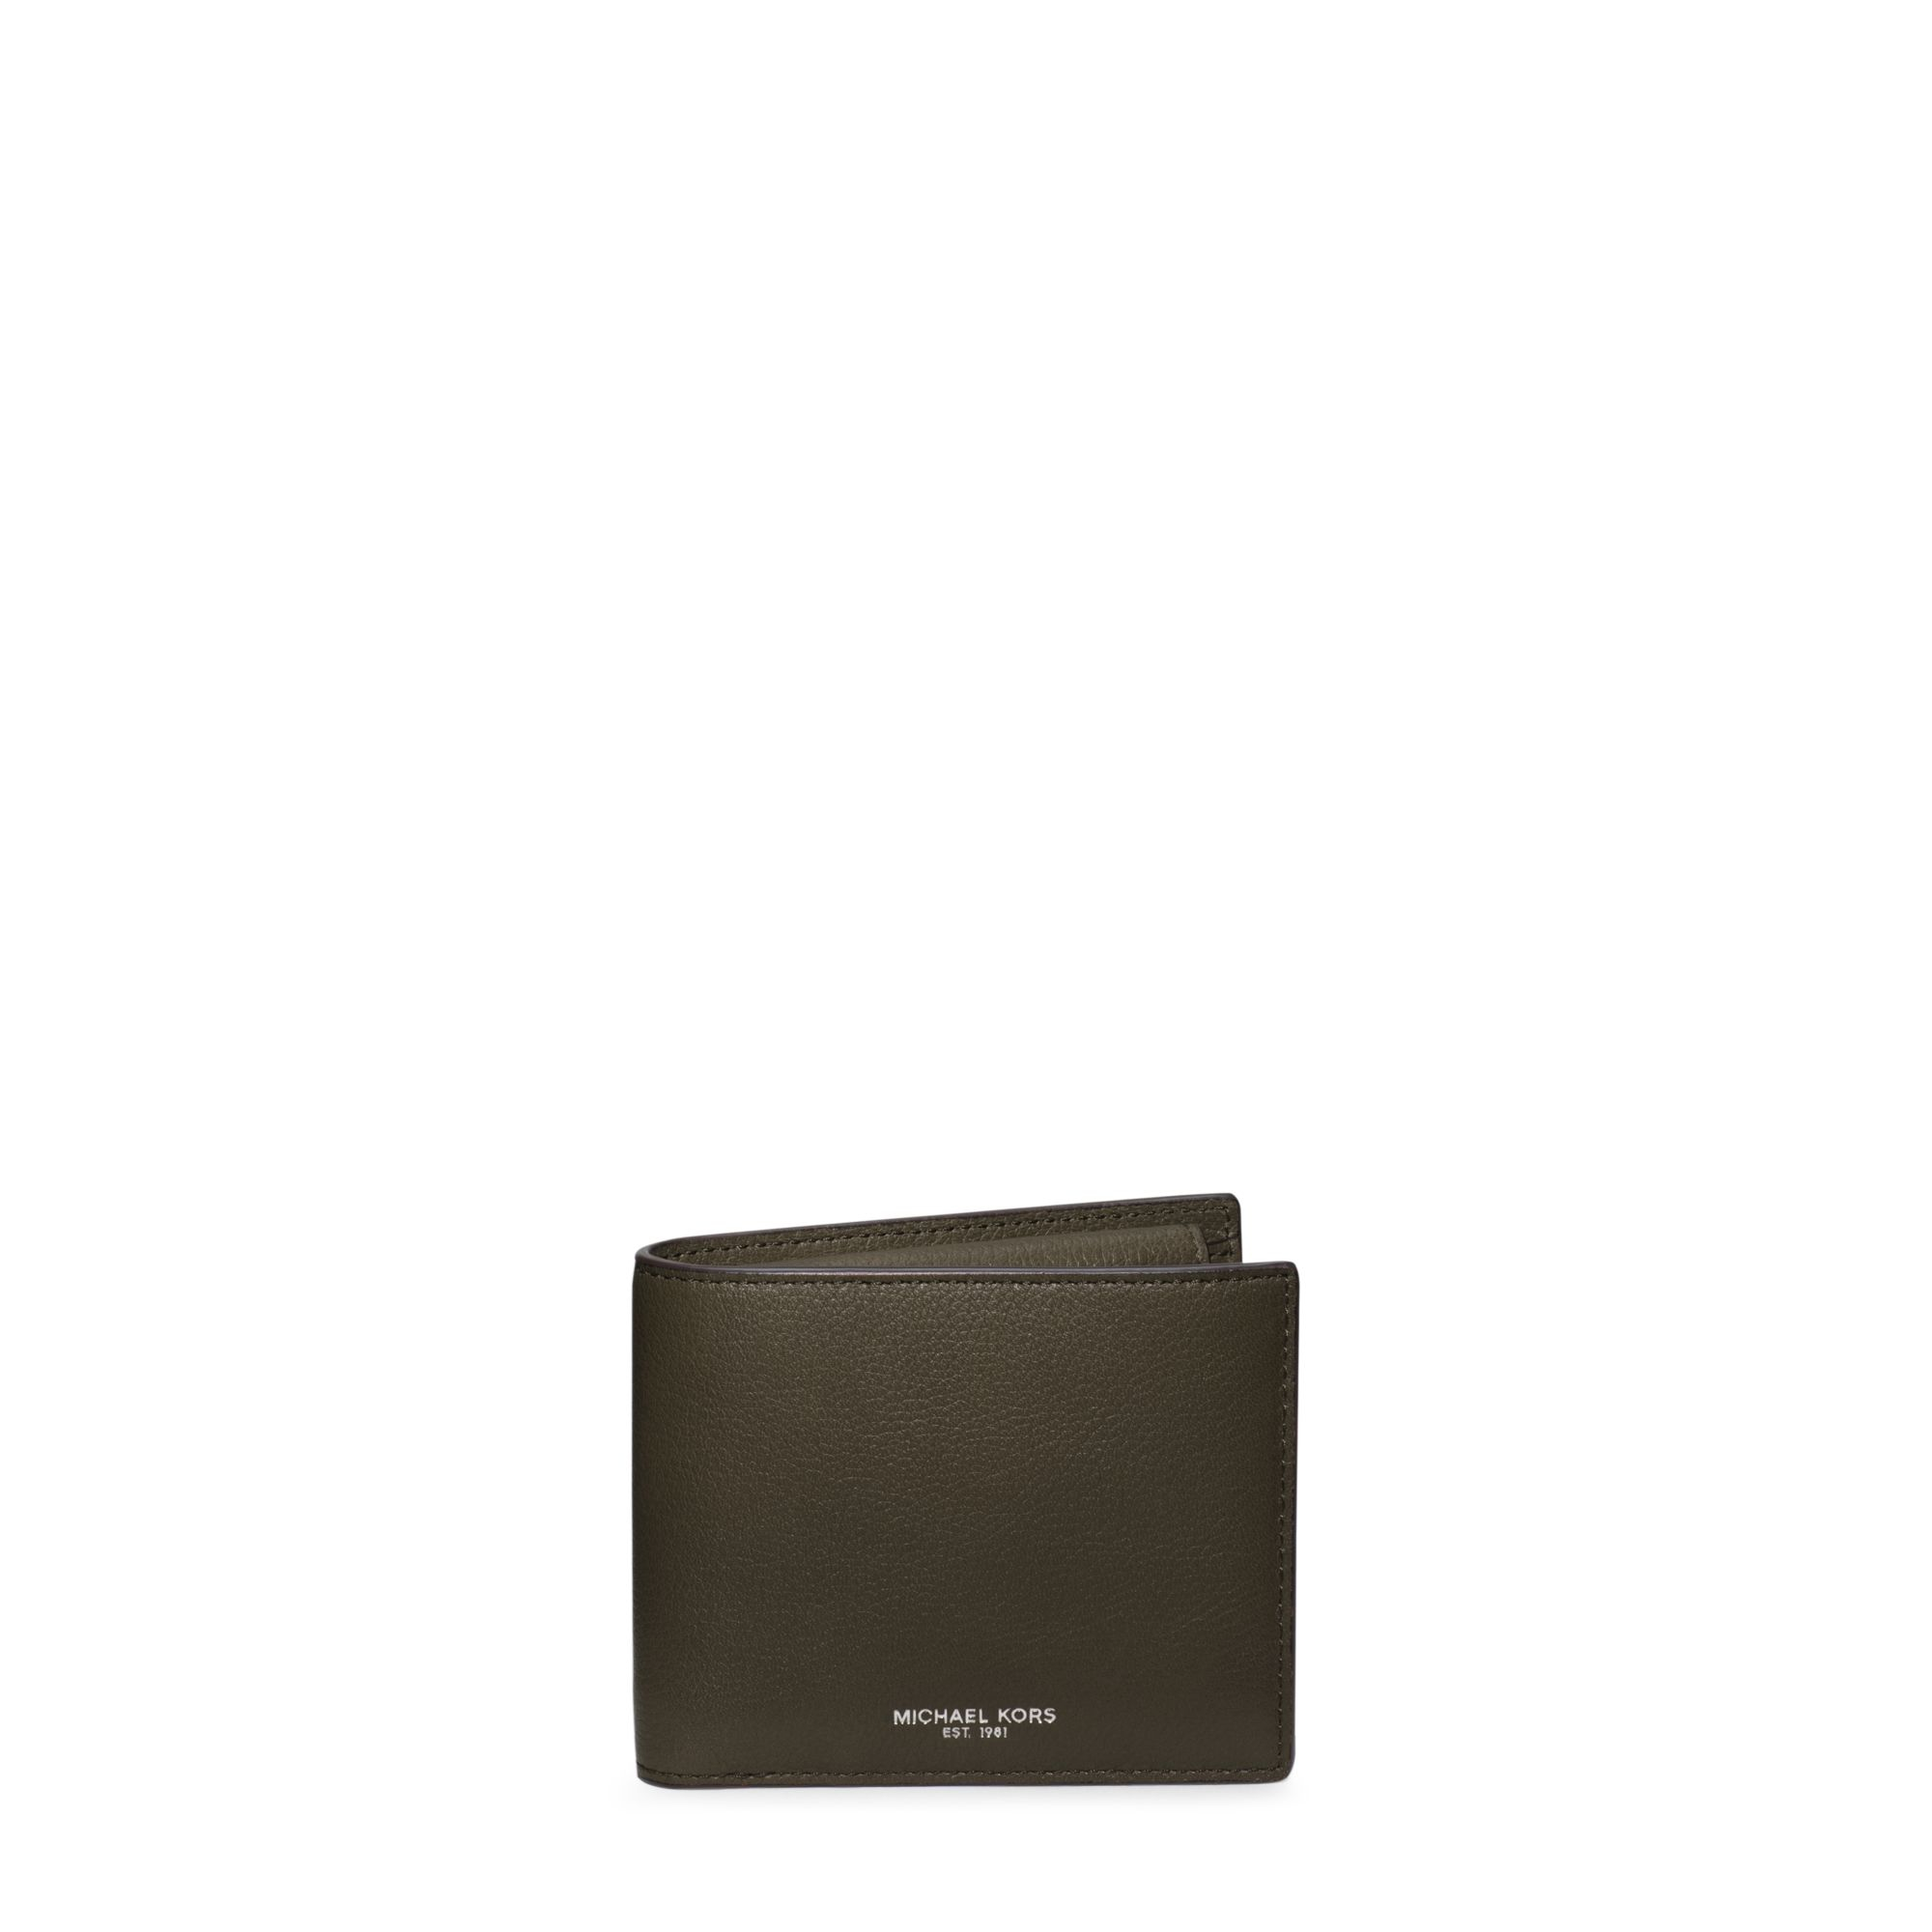 6c09079cd9faf0 Michael Kors Bryant Coin-pocket Leather Billfold Wallet in Green for ...